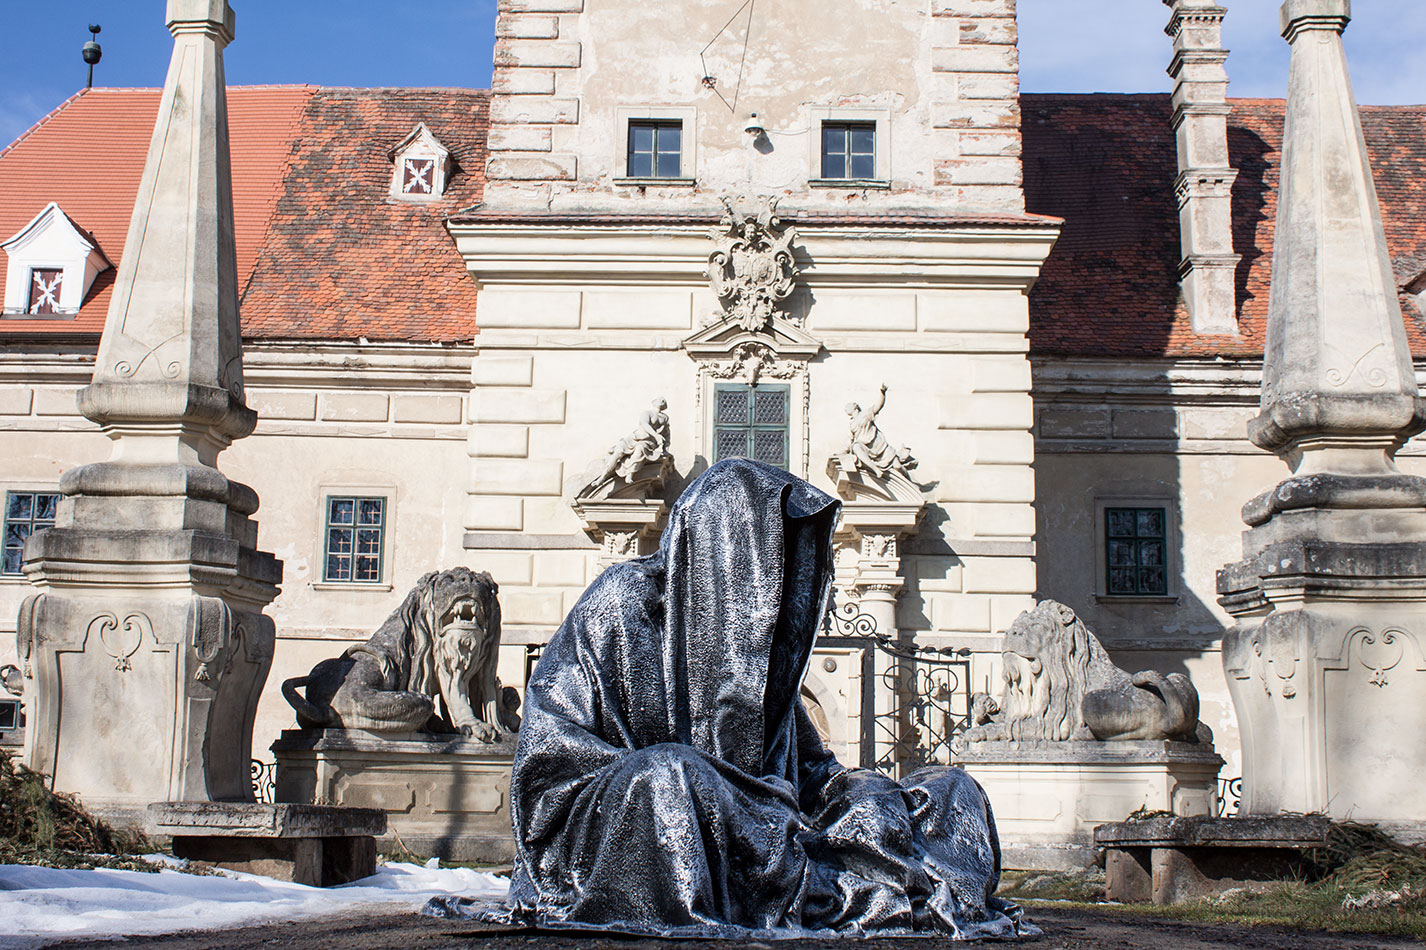 castle-greilenstein-lower-austria-wood-quater-waldviertel-guardians-of-time-contemporary-art-sculpture-design-antique-manfred-kielnhofer-7384